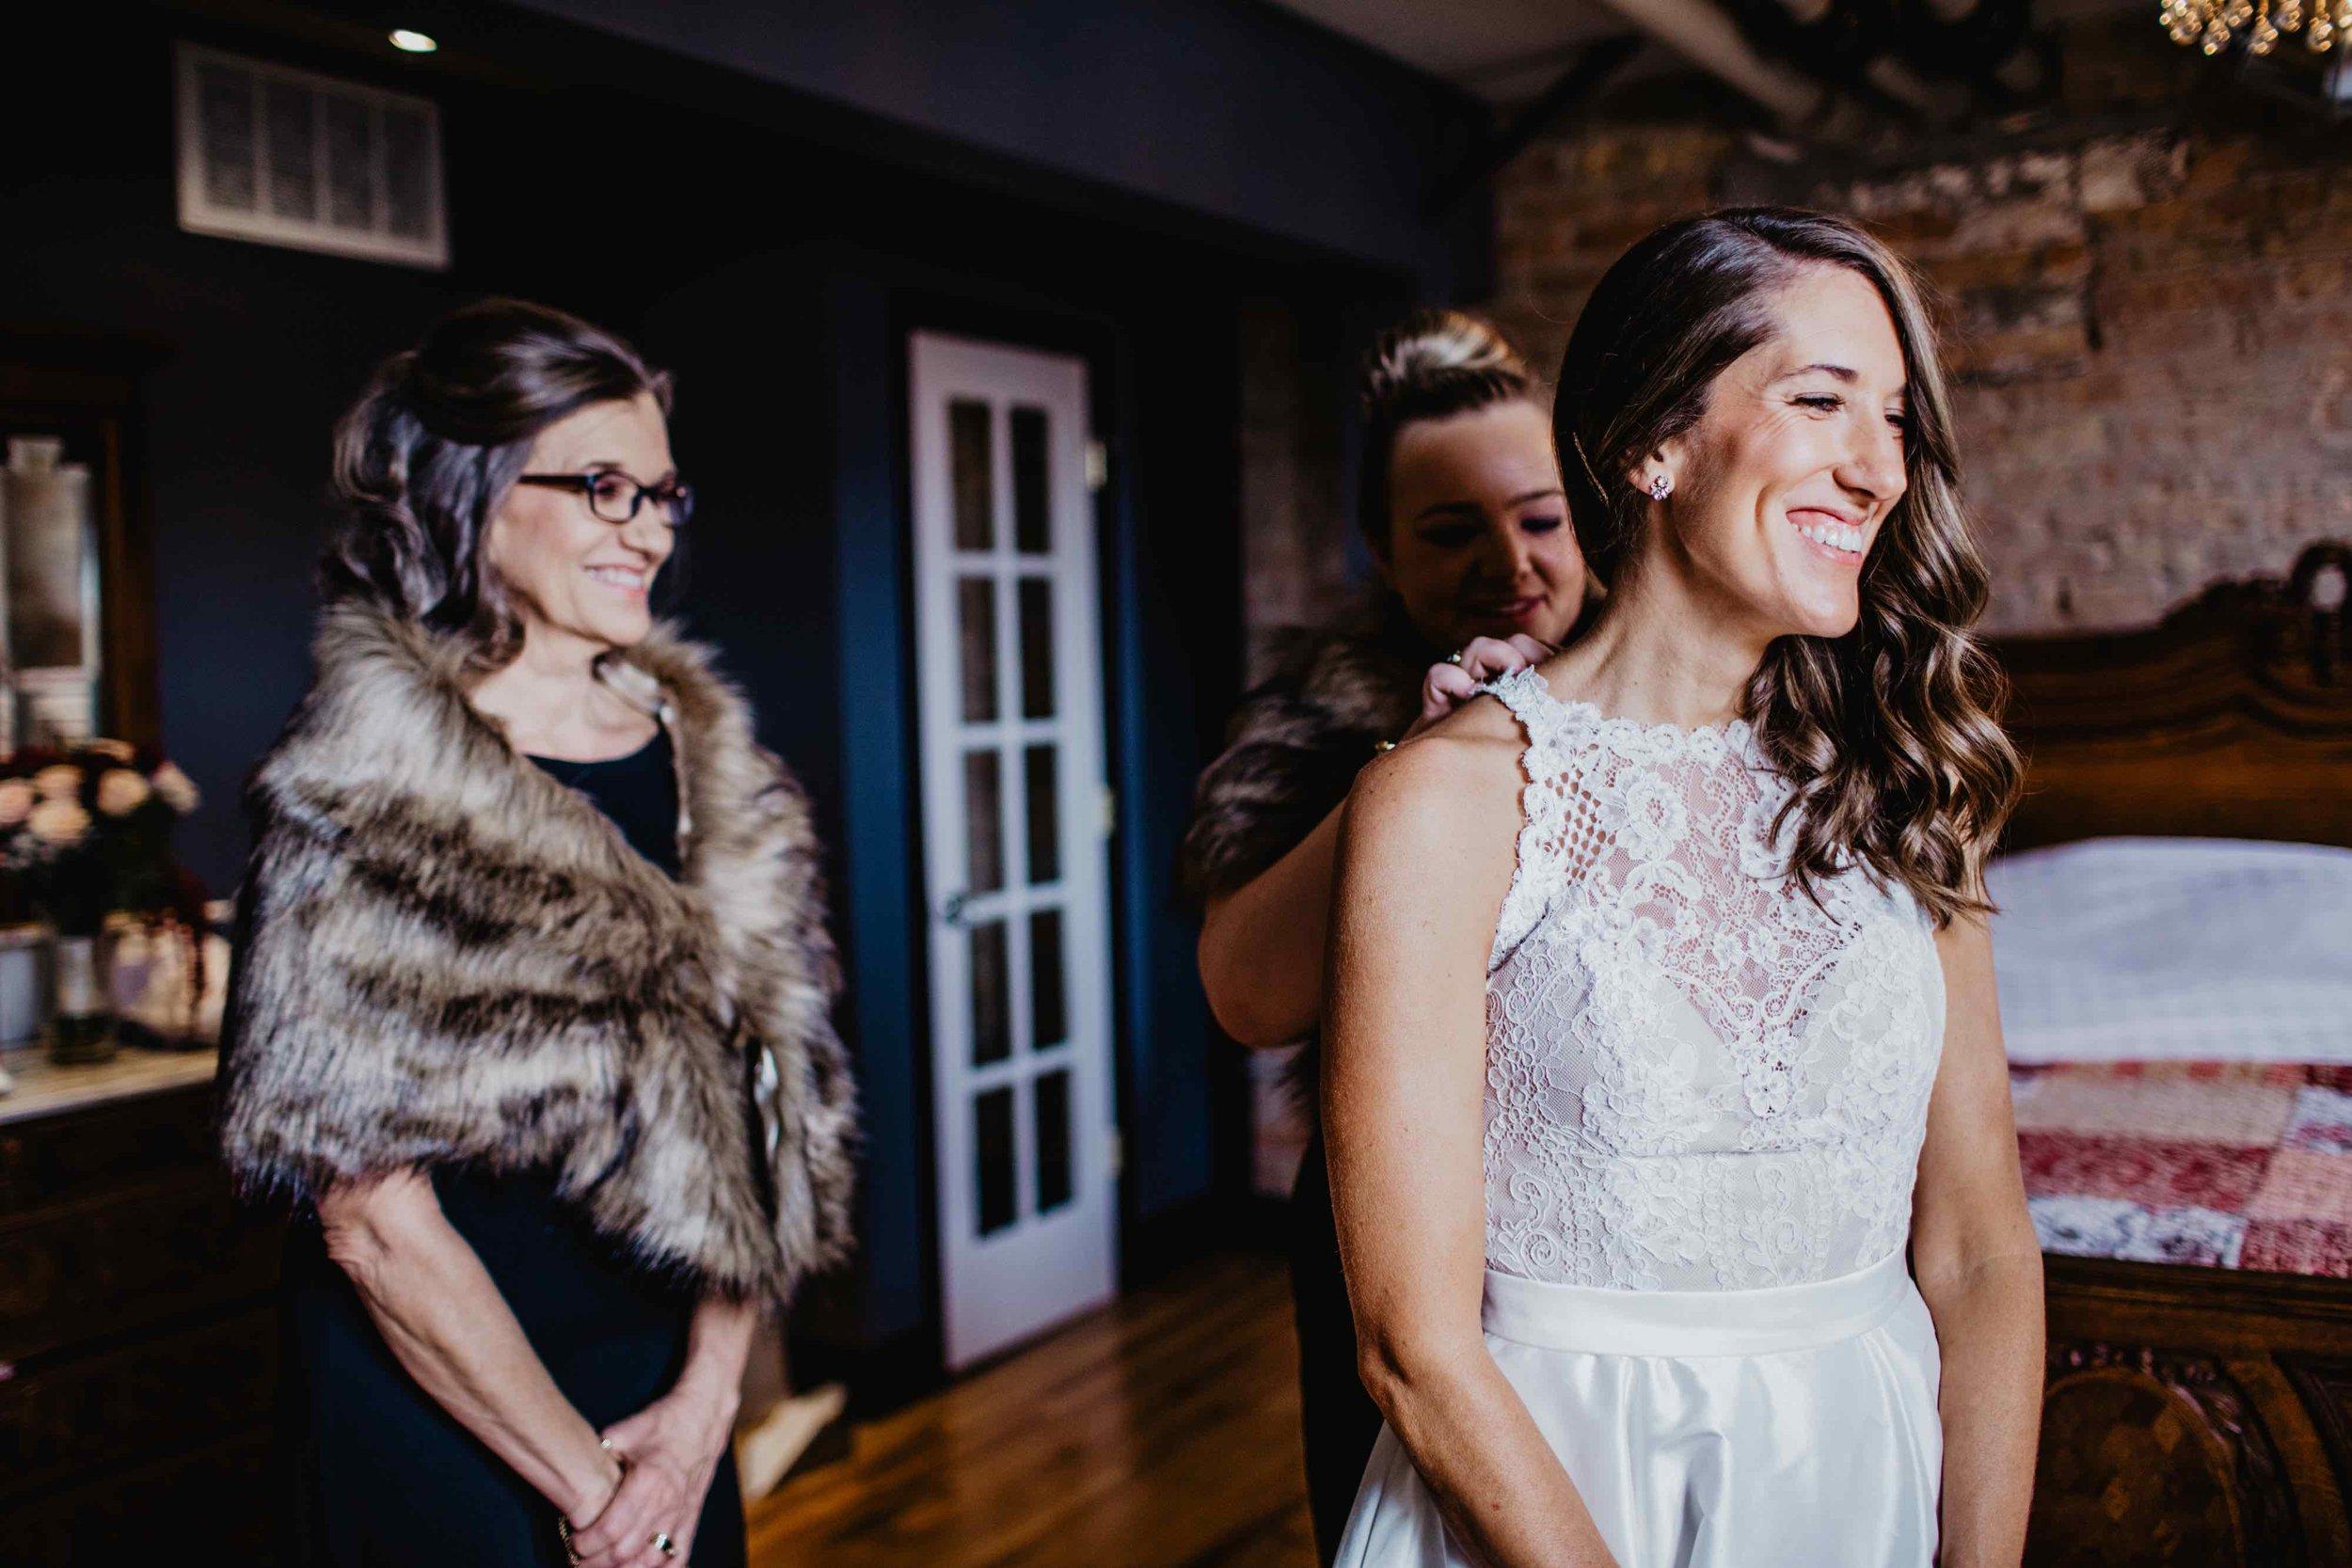 Kisa Conrad Favorites-0015-colorado-wedding-photographer-denver-springs-vailhotel-glenwood-springs-colorado-wedding-photographer.jpeg